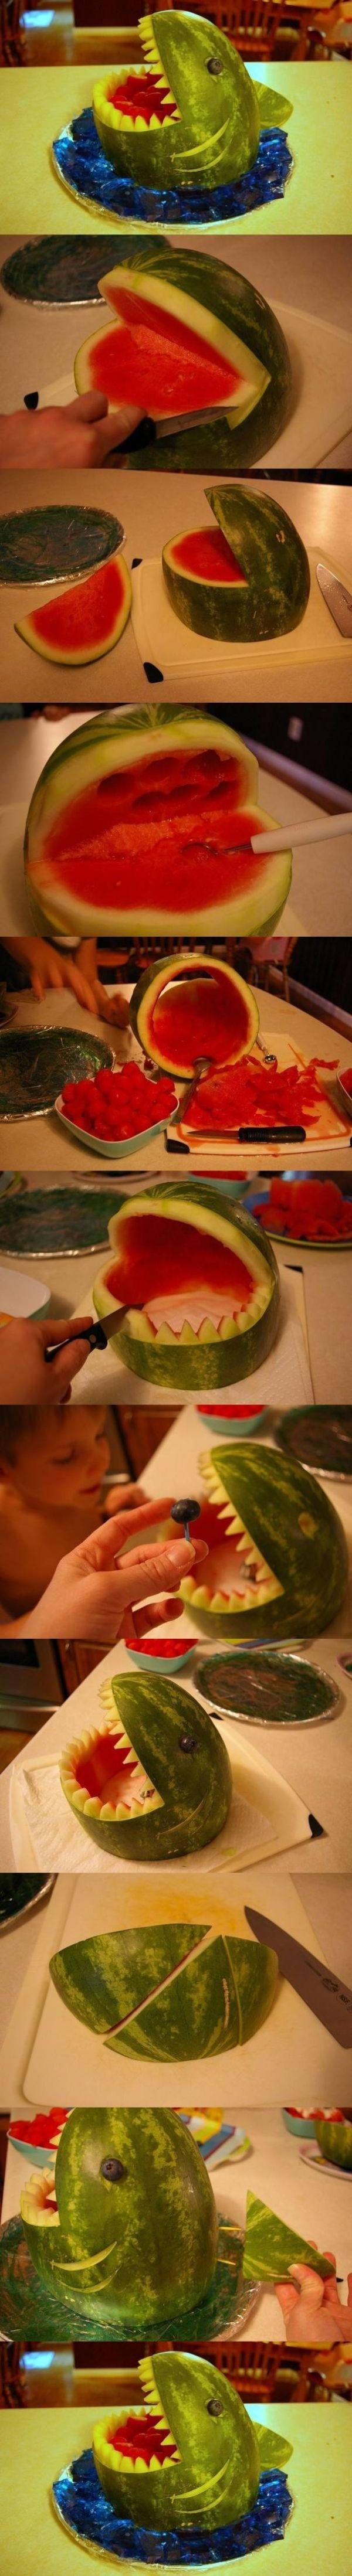 DIY Watermelon Shark Carving Internet Tutorial~ Tutorial by diyforever~